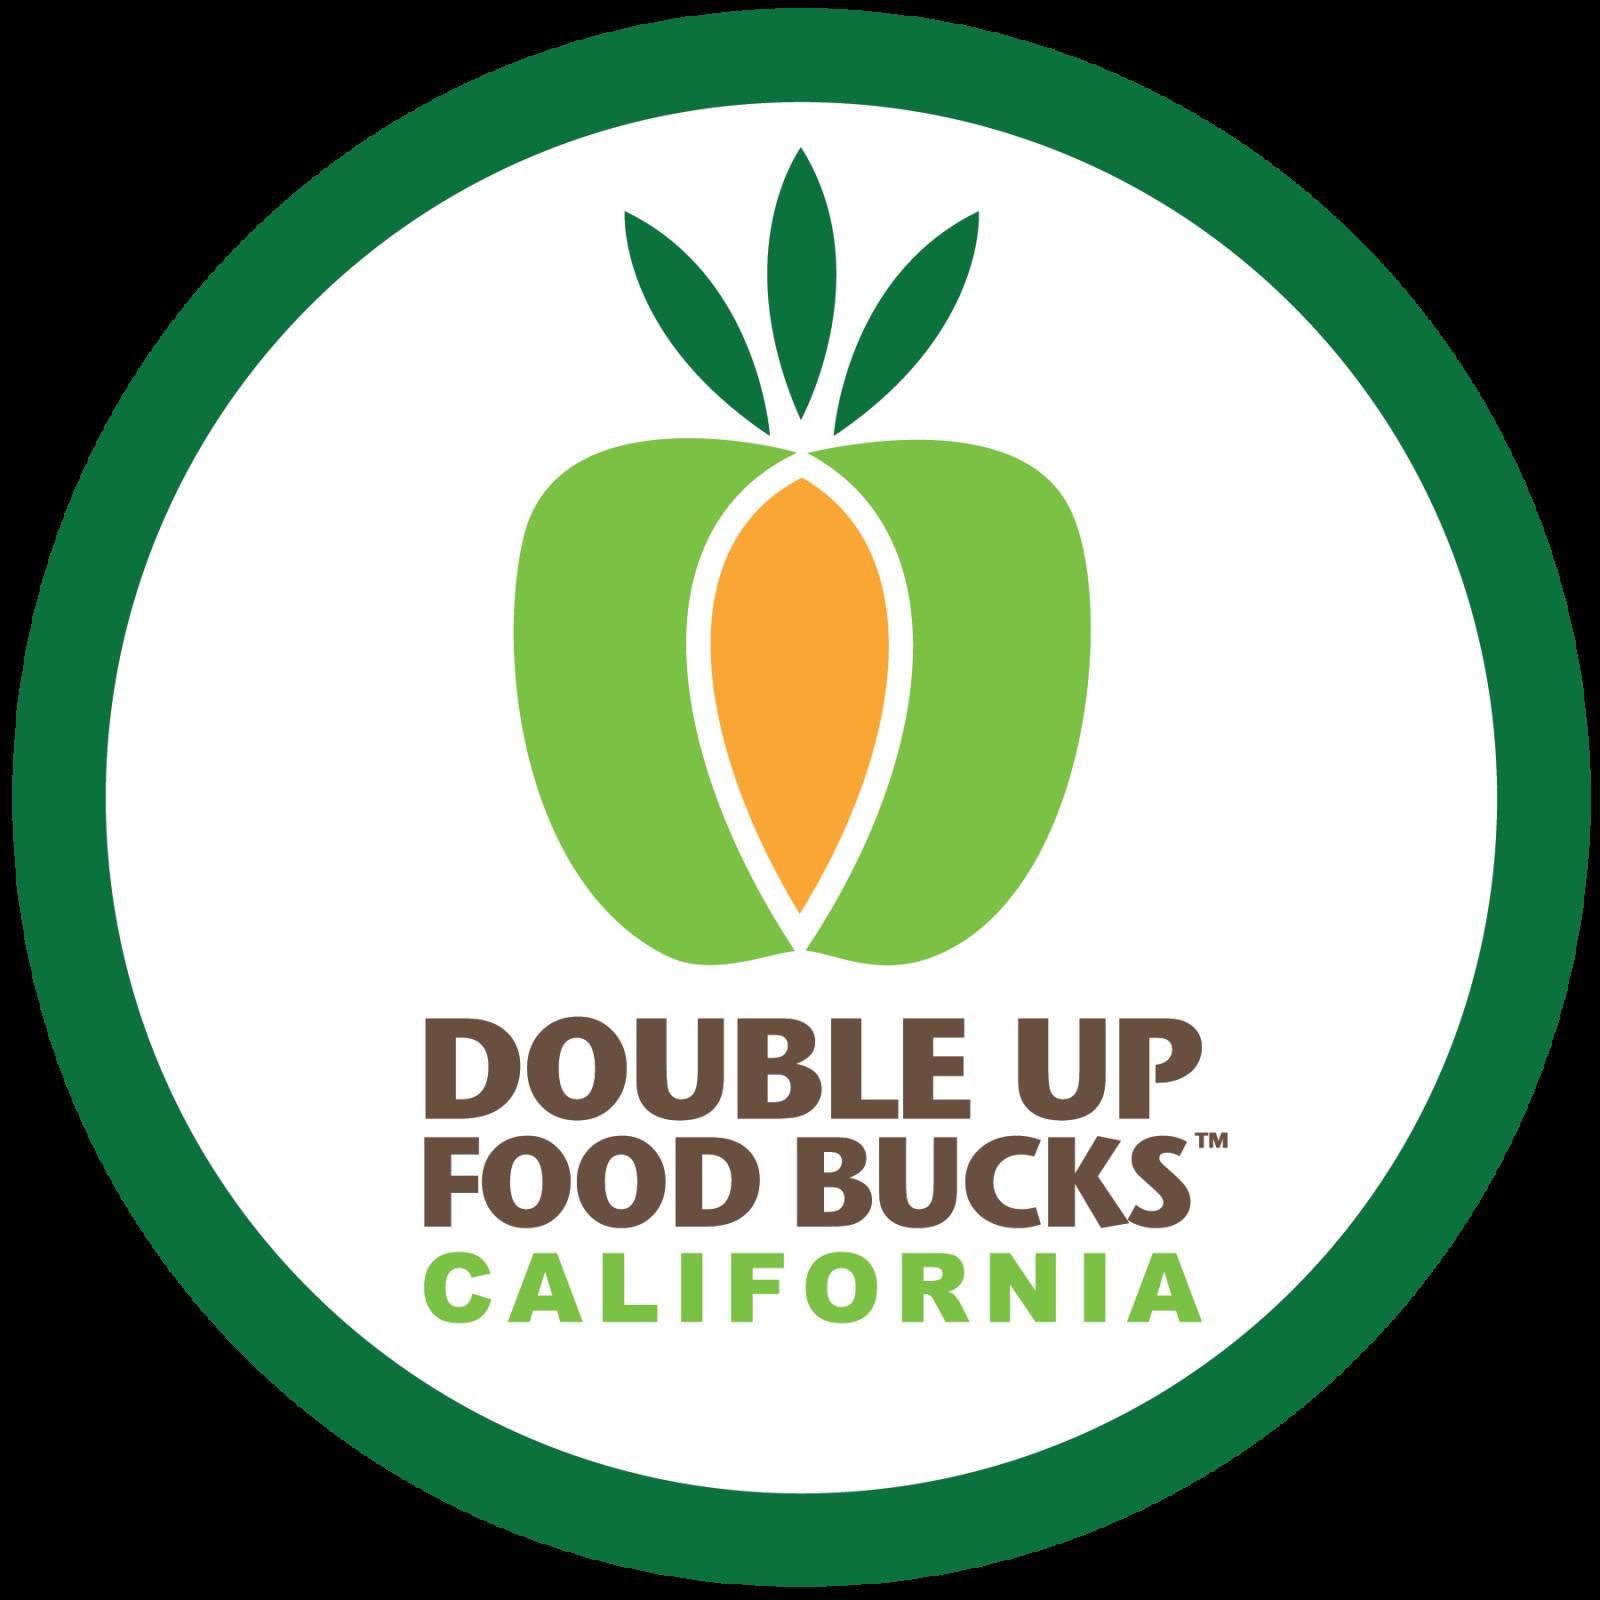 Double Up Food Bucks California logo